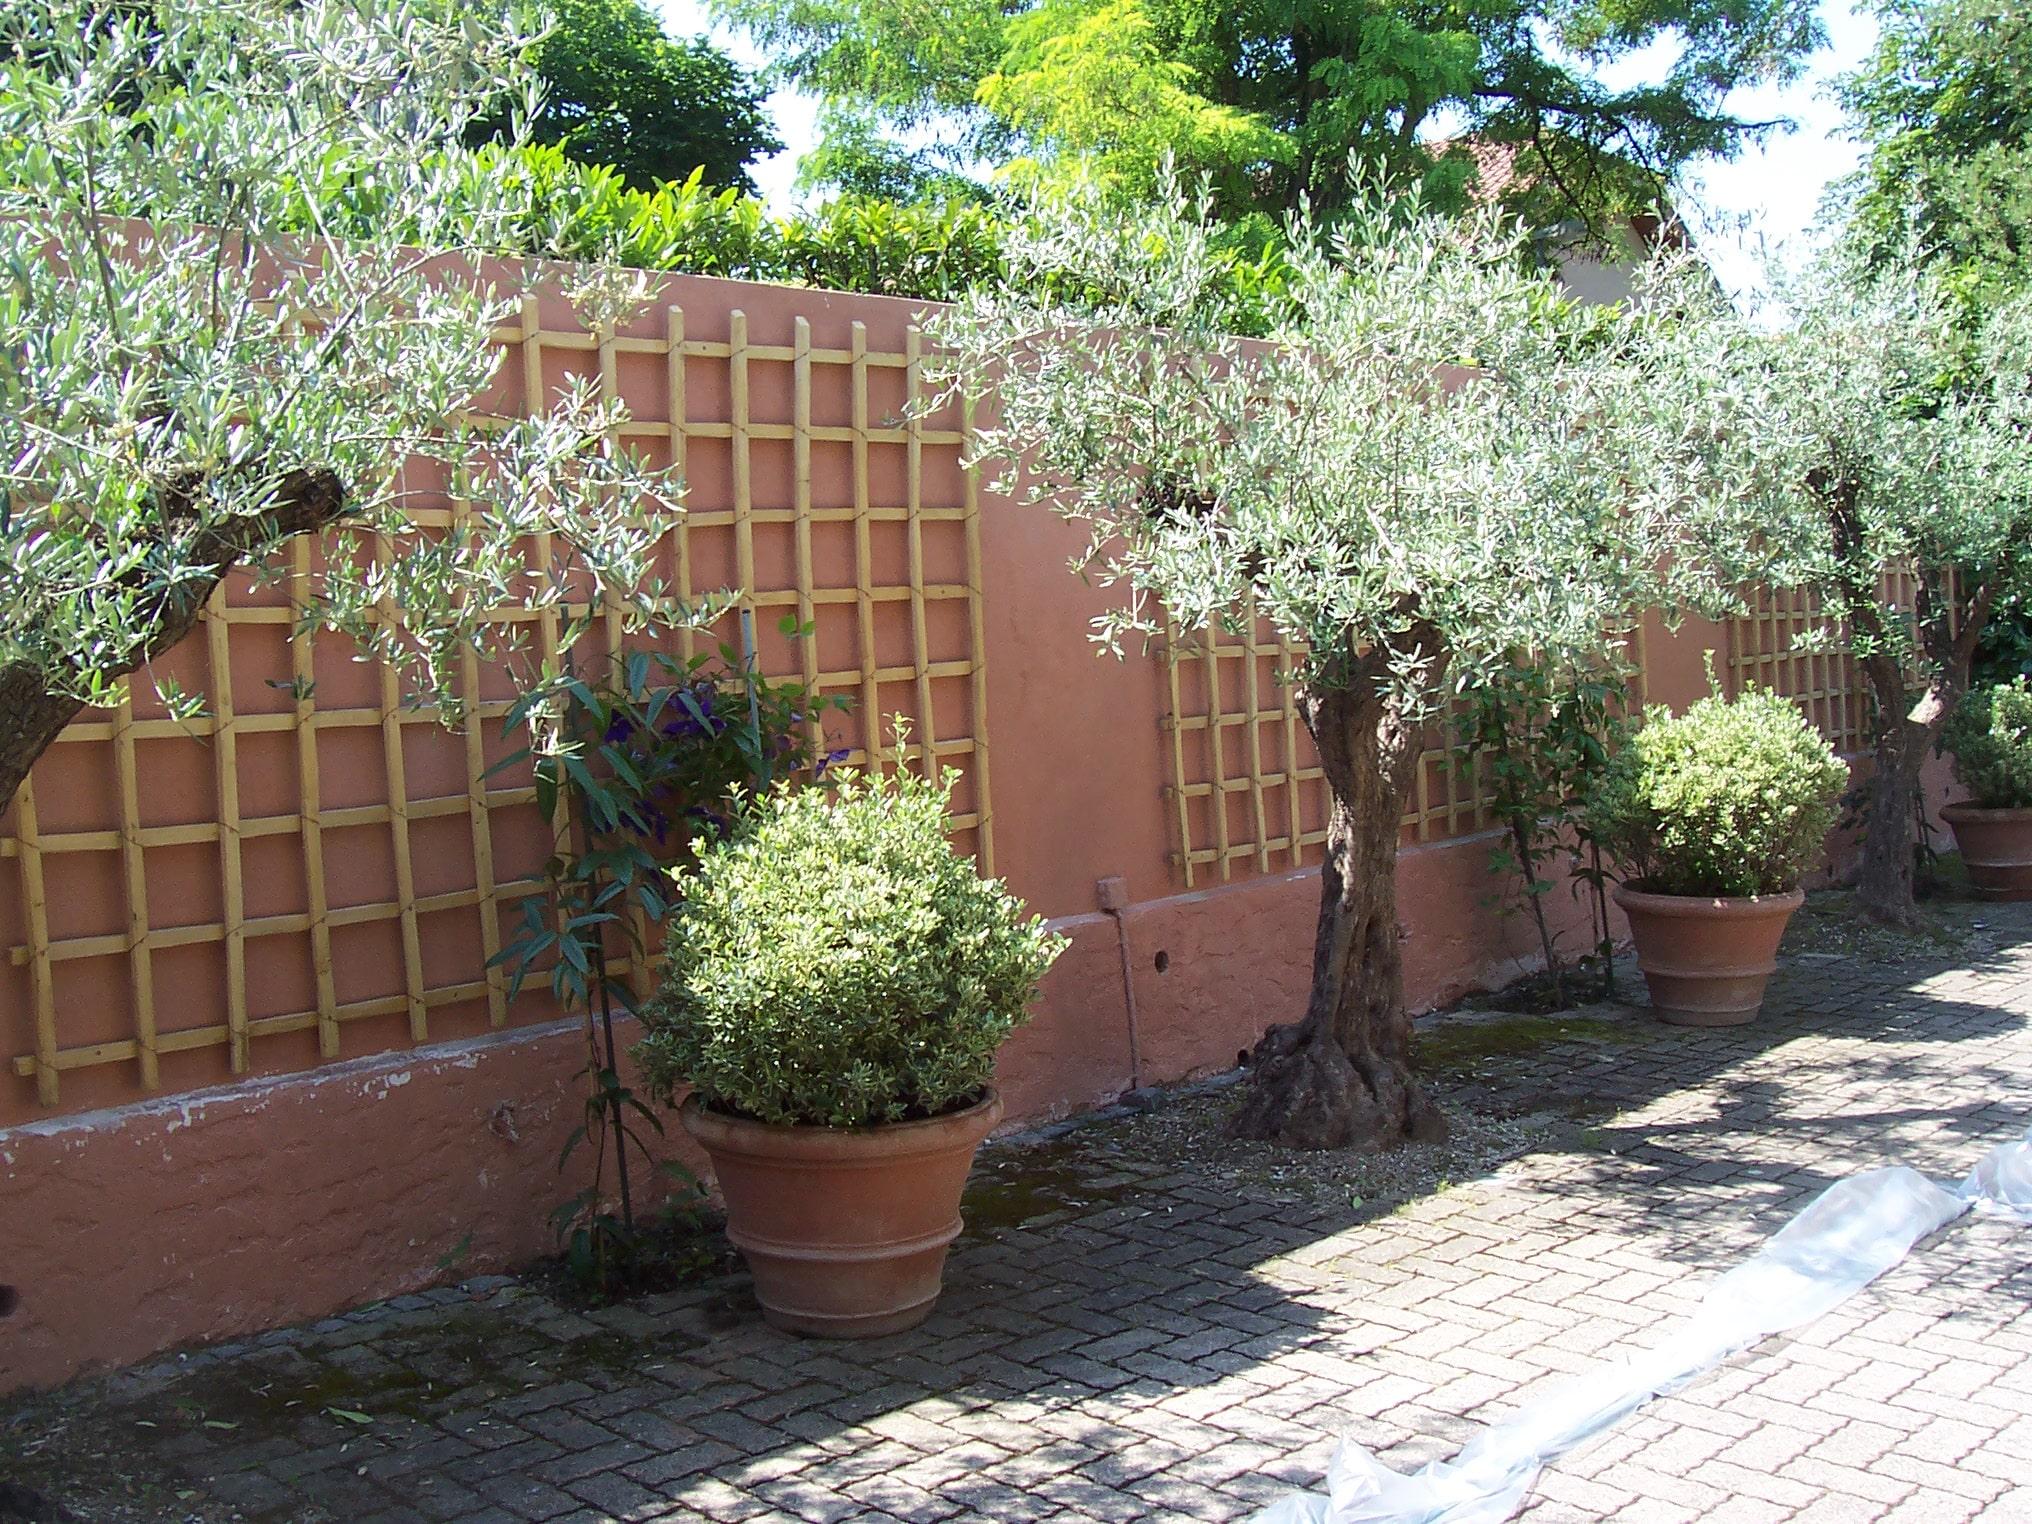 Les ateliers aubert labansat - Mobilier de jardin wikipedia marseille ...